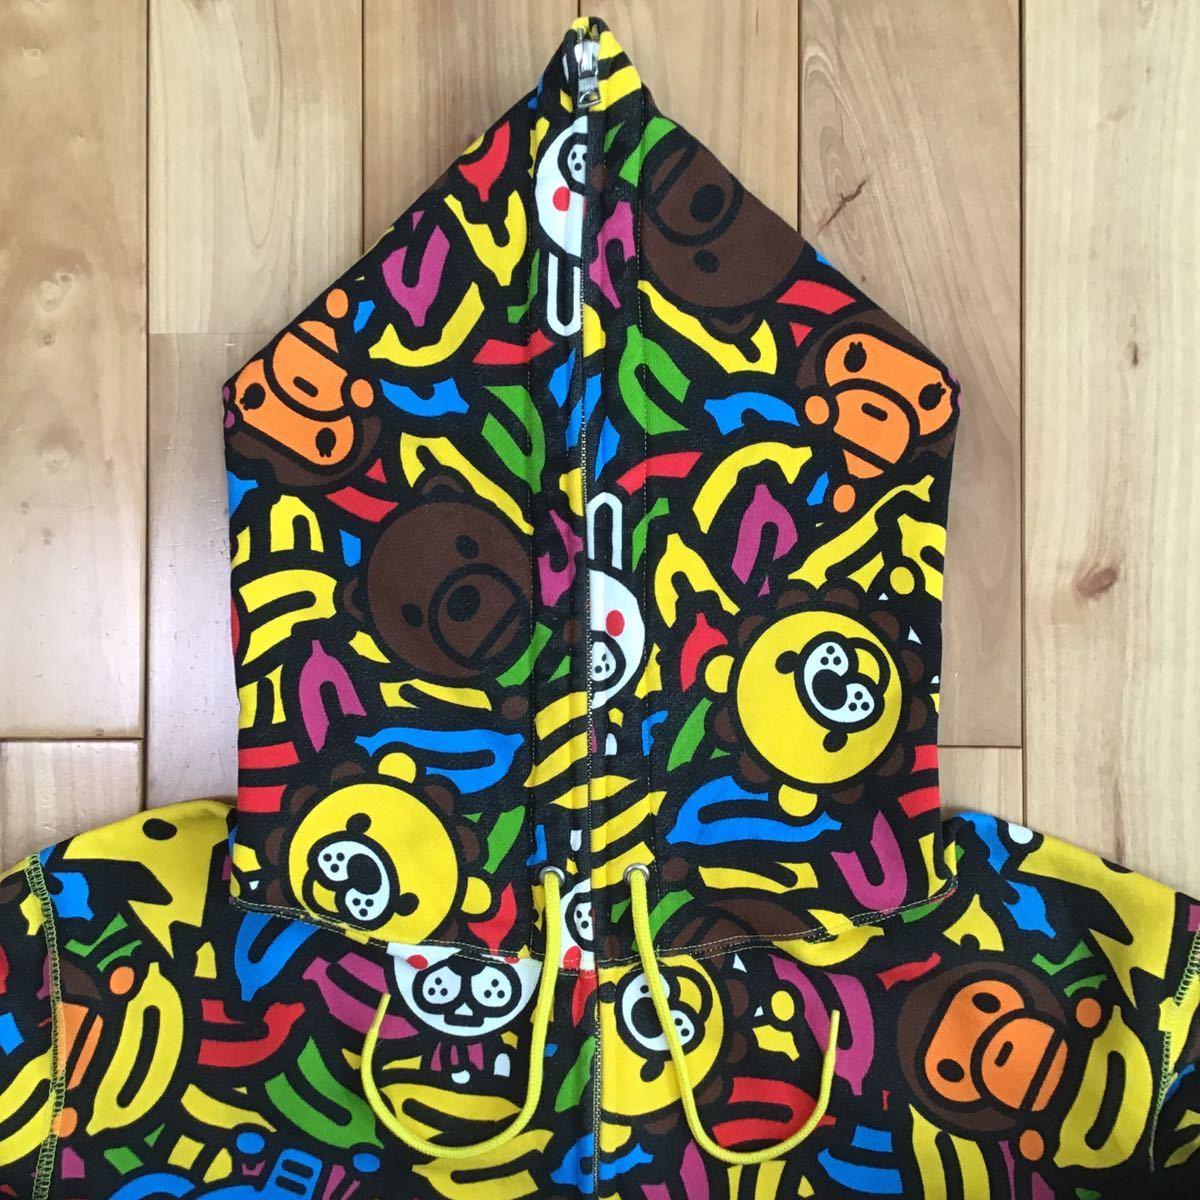 ★XL★ アニマル バナナ マイロ フルジップ パーカー a bathing ape BAPE sta full zip hoodie milo Safari animal banana エイプ ベイプ